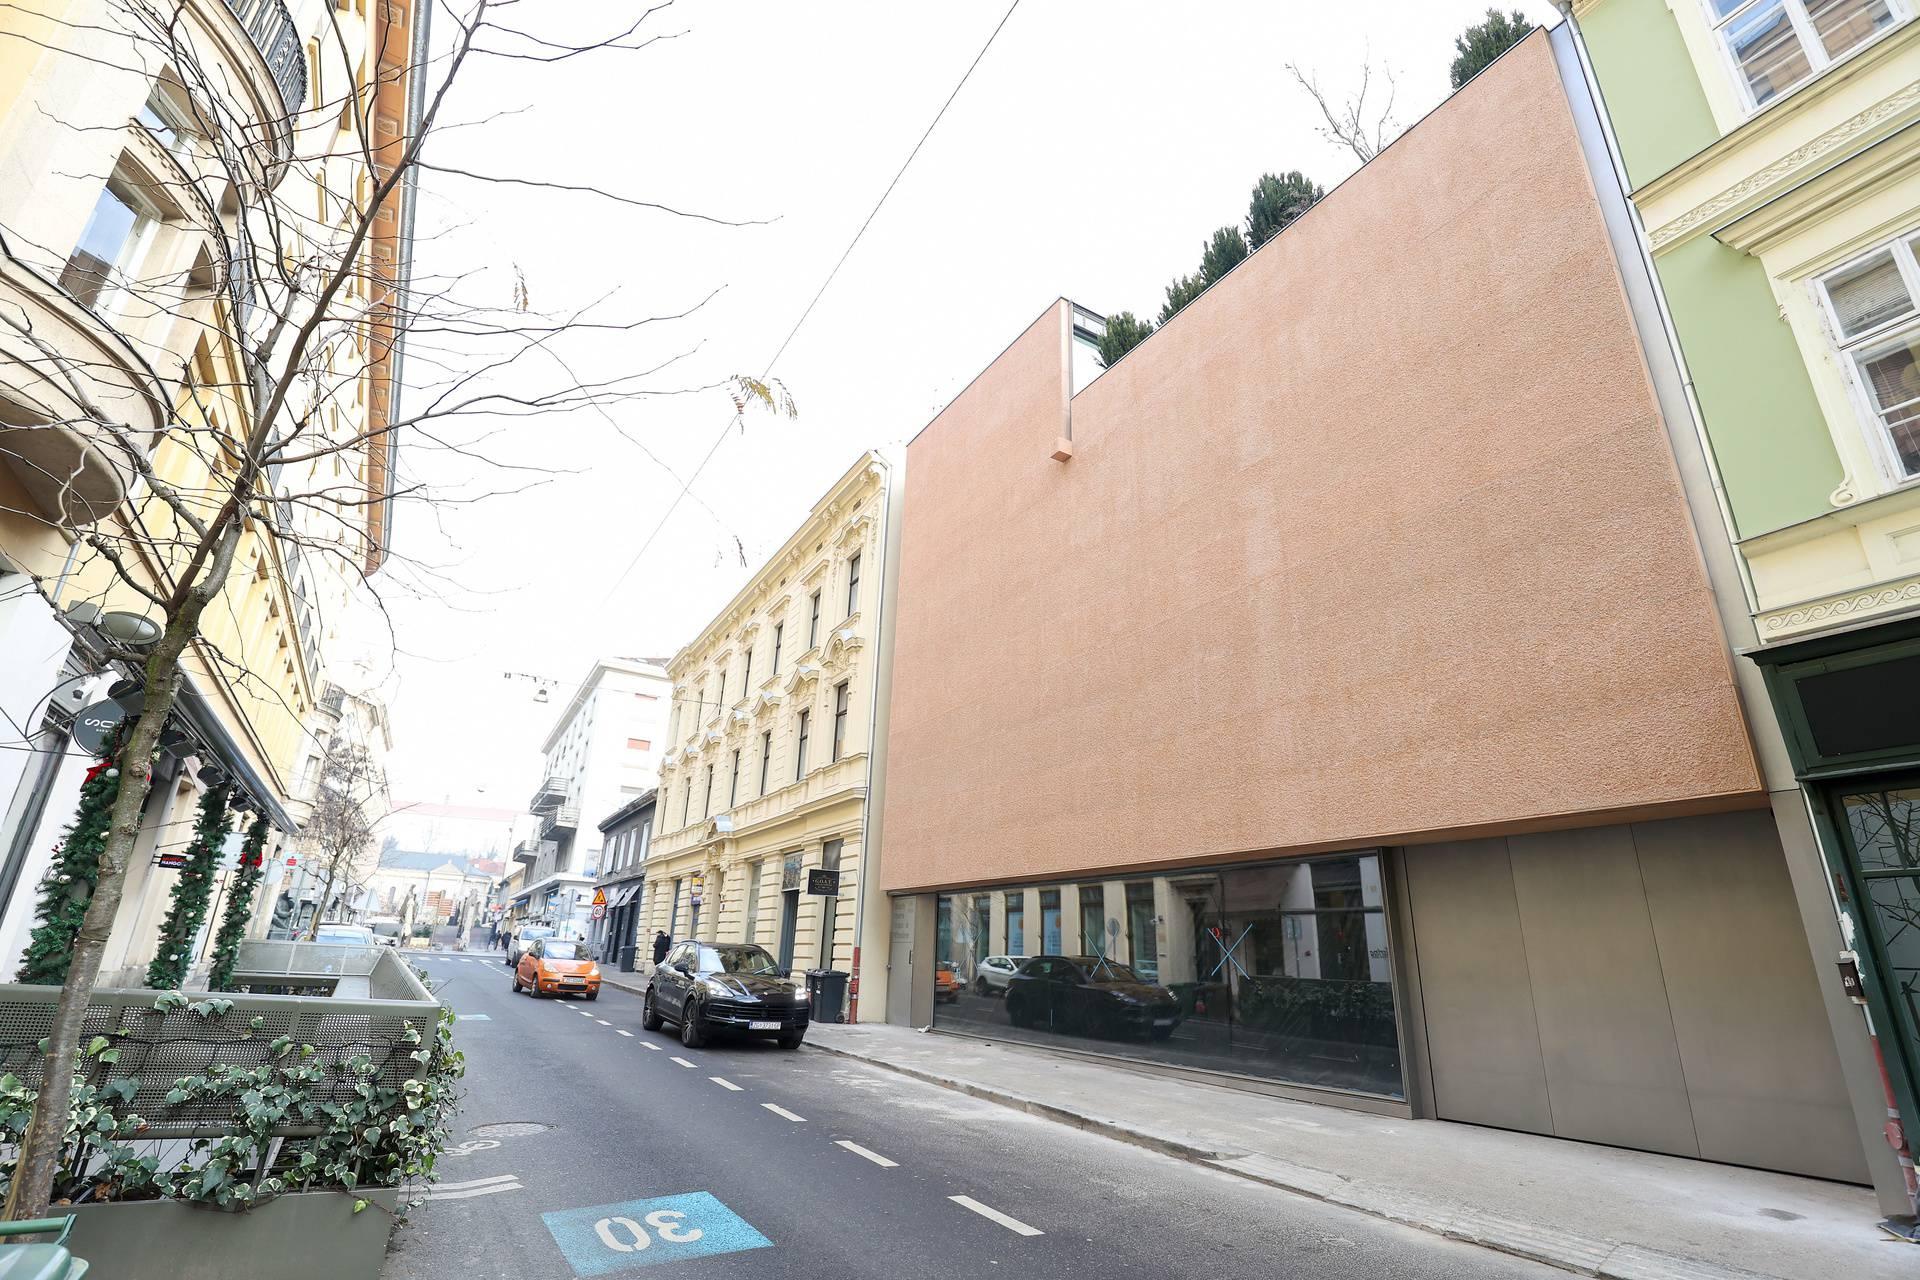 Zagreb: Prvi puta nakon dugo vremena gradnje vidi se pravo pročelje na viliAnte Vlahovića